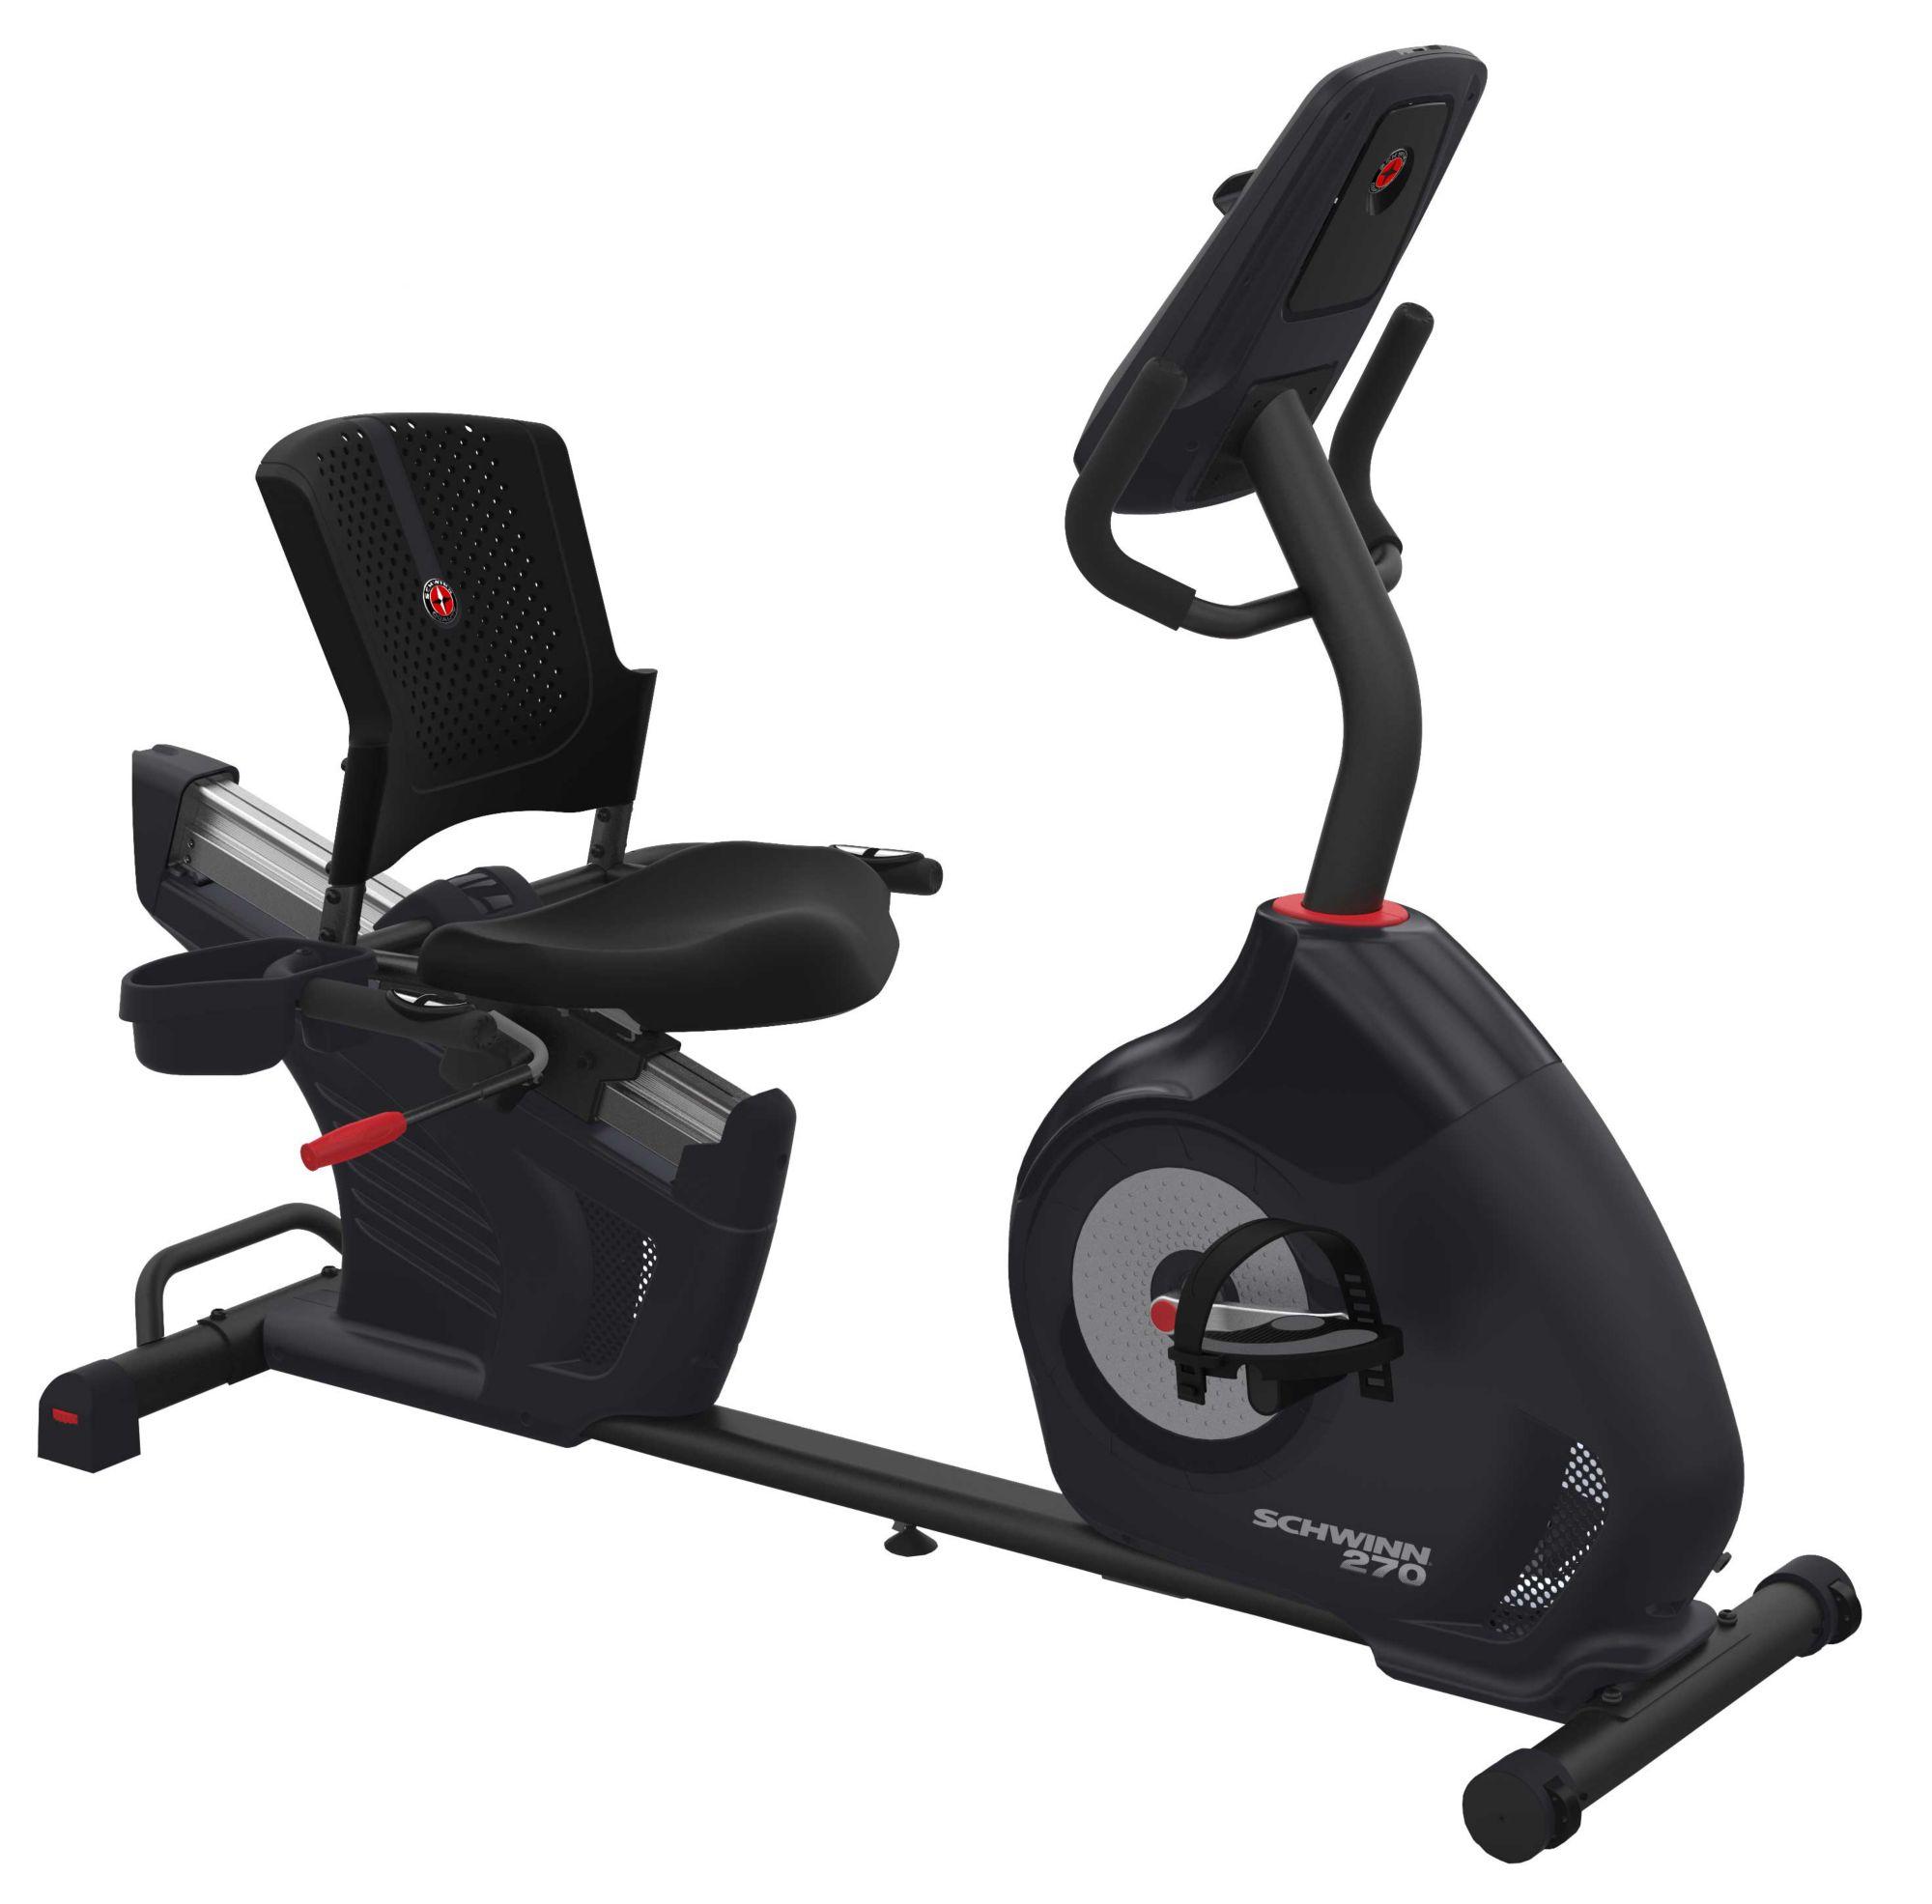 Schwinn 270 Recumbent Exercise Bike Recumbent Bike Workout Biking Workout No Equipment Workout